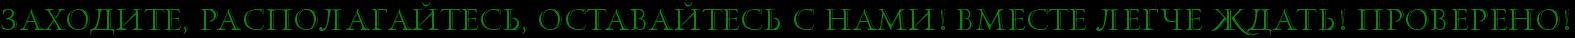 http://x-lines.ru/letters/i/cyrillicfancy/0103/128214/22/1/4nm7bcgtozem7wfw4nhpdysoswsnbwcy4napdyqoz9em7wf54napbc6osdemuwcn4n47dyqttosnbwf64gy7dysosdemfwfo4nh7dysoszeadwccrdeanegozzembwfh4nhnnego1mem3wfi4gy7dysoswopbq6oszem8wc84n41bwfs4n4pbcgtomeaaejy4nx7dygoz5emfwfi4gypbpqozzemhee.png